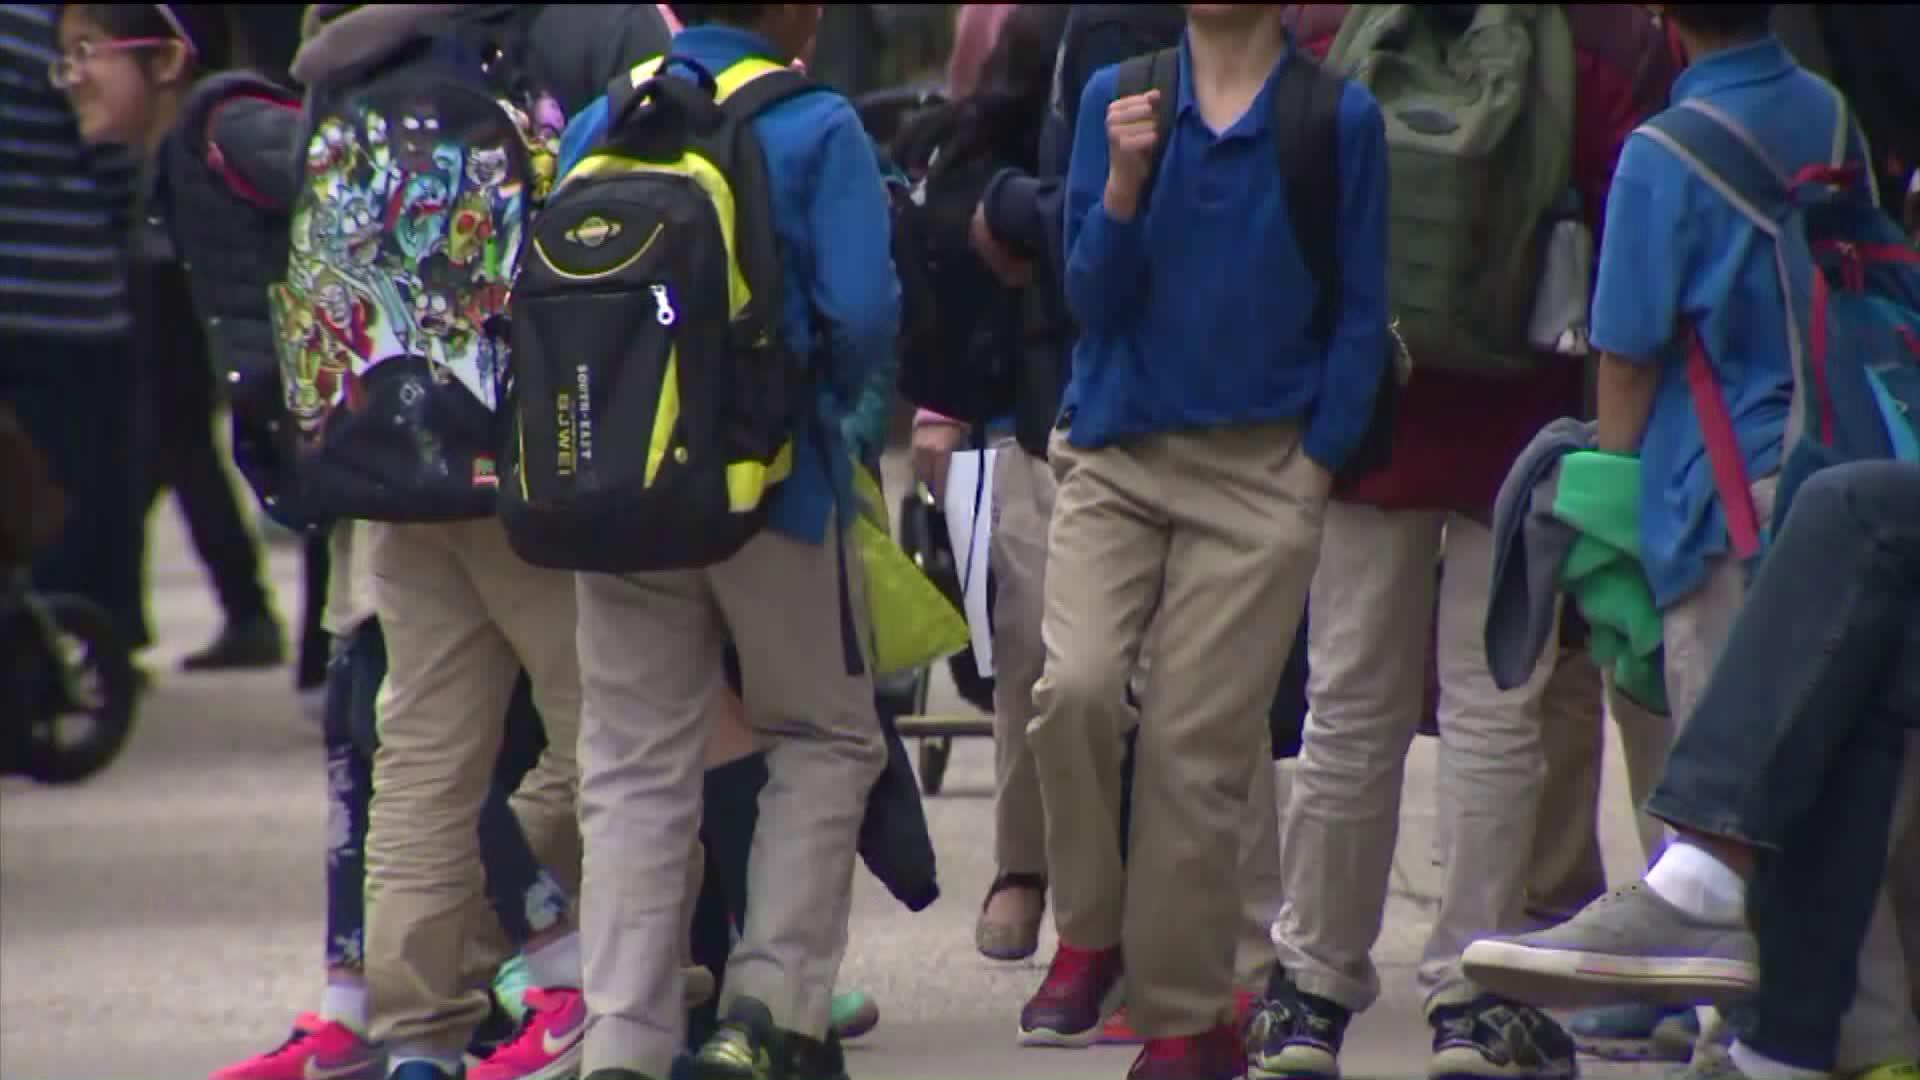 Nearly 300 Jersey City teachers receive layoff notices during Teacher AppreciationWeek